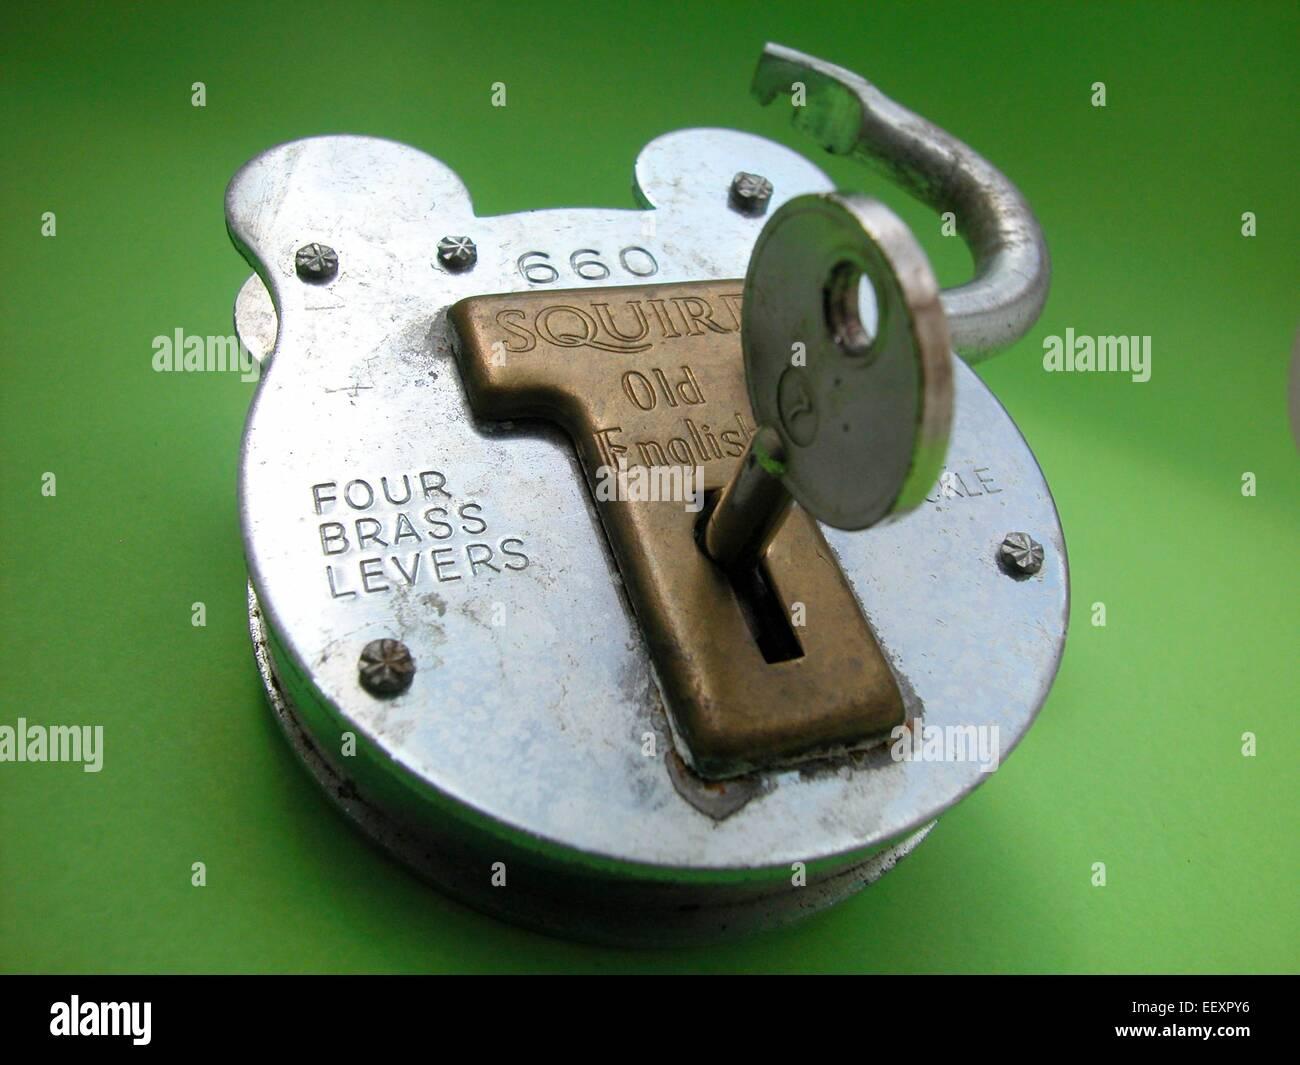 Squire padlock lock unlocked with key - Stock Image